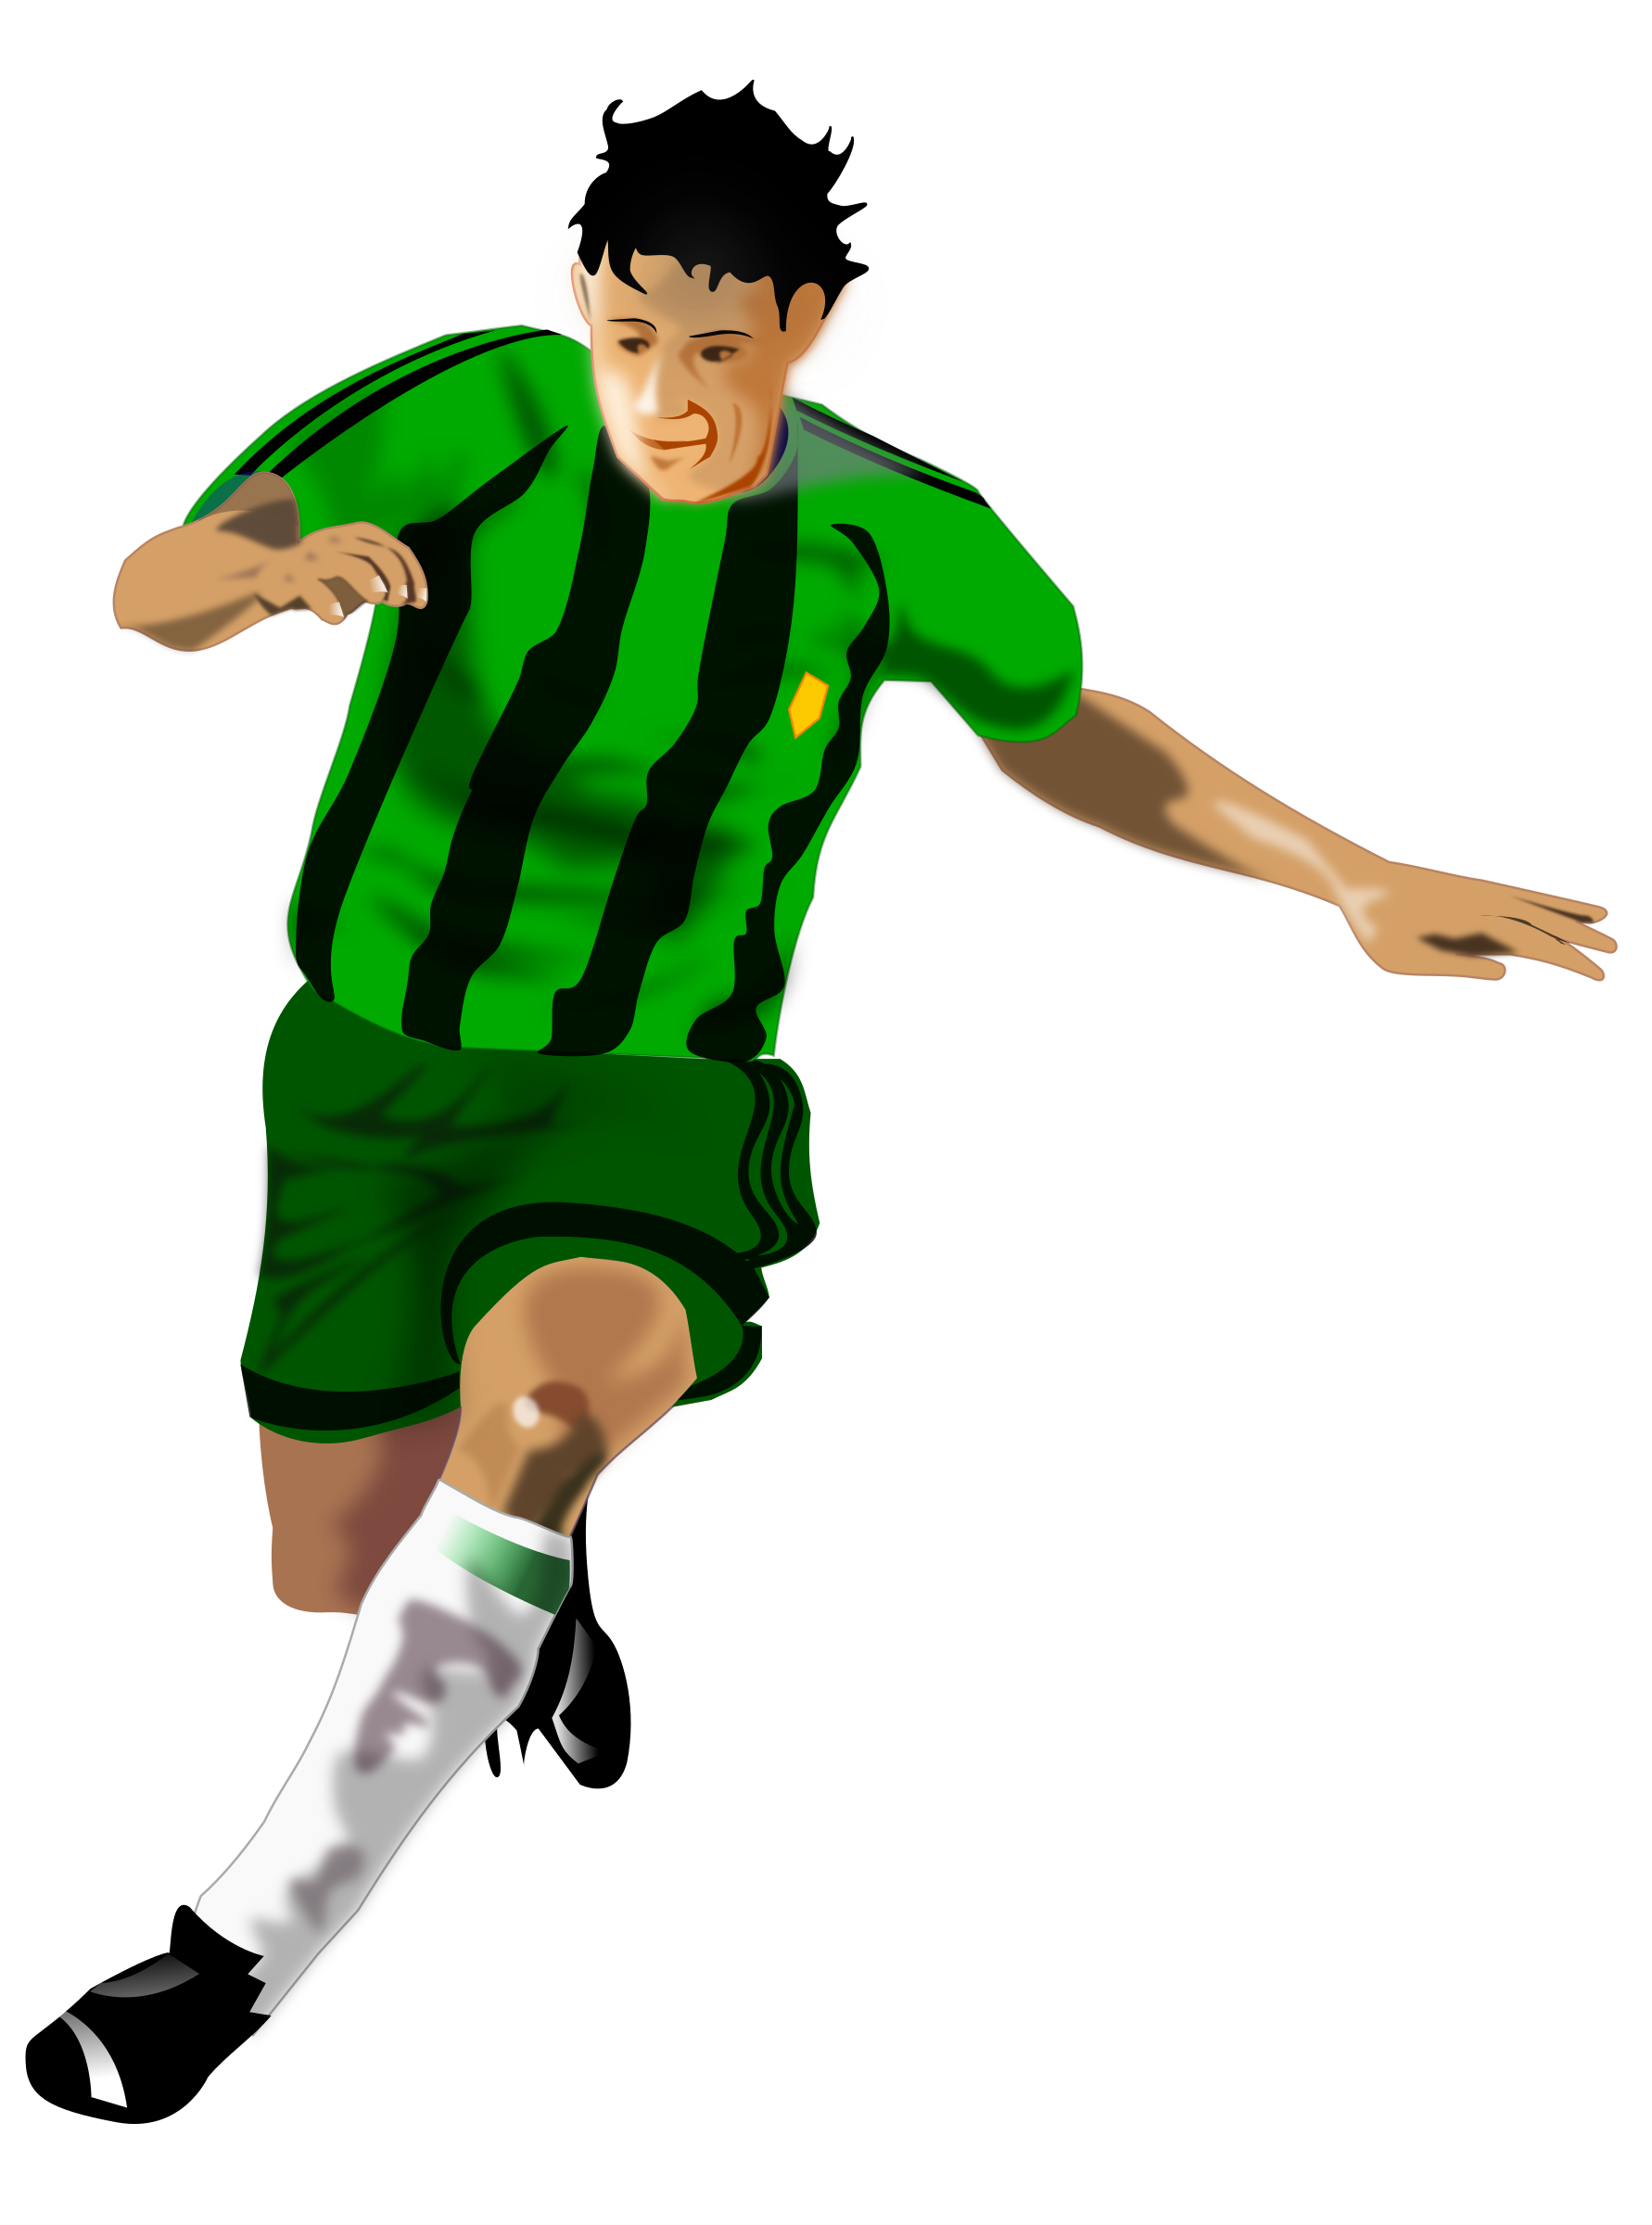 Player green black big. Knee clipart soccer injury